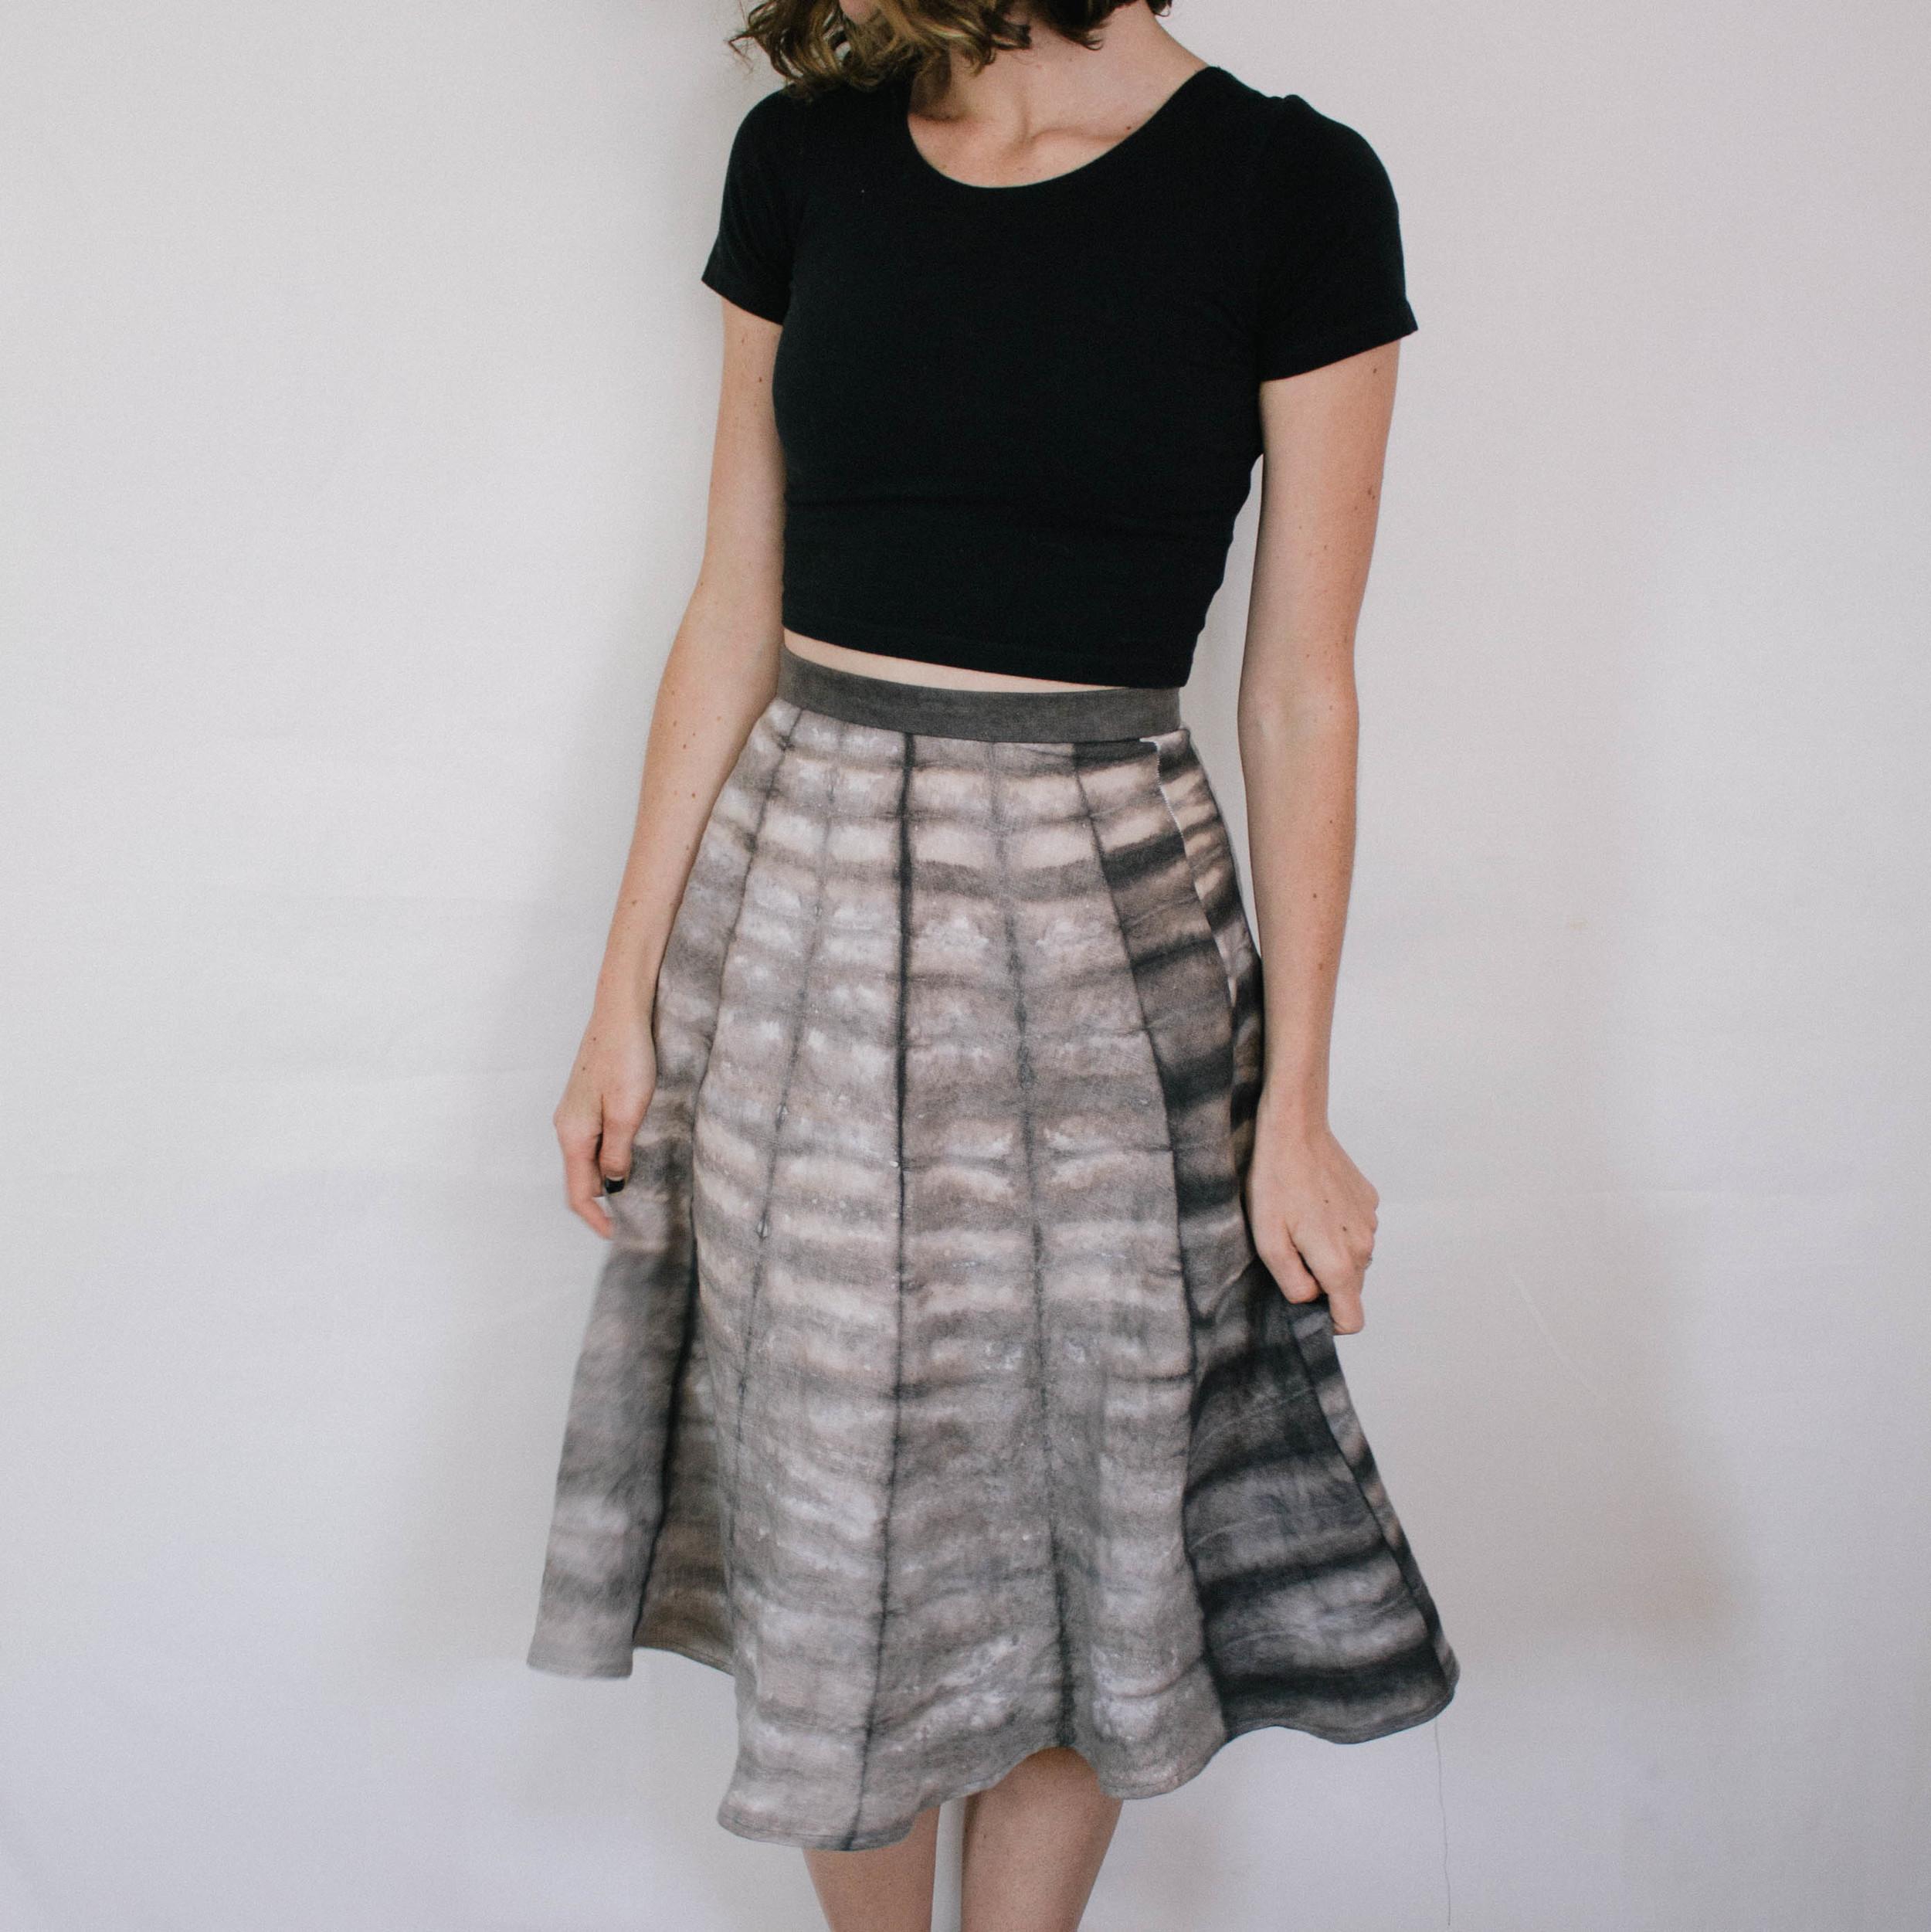 Shibori Linen Skirt // Natural Acorn Dye // $75